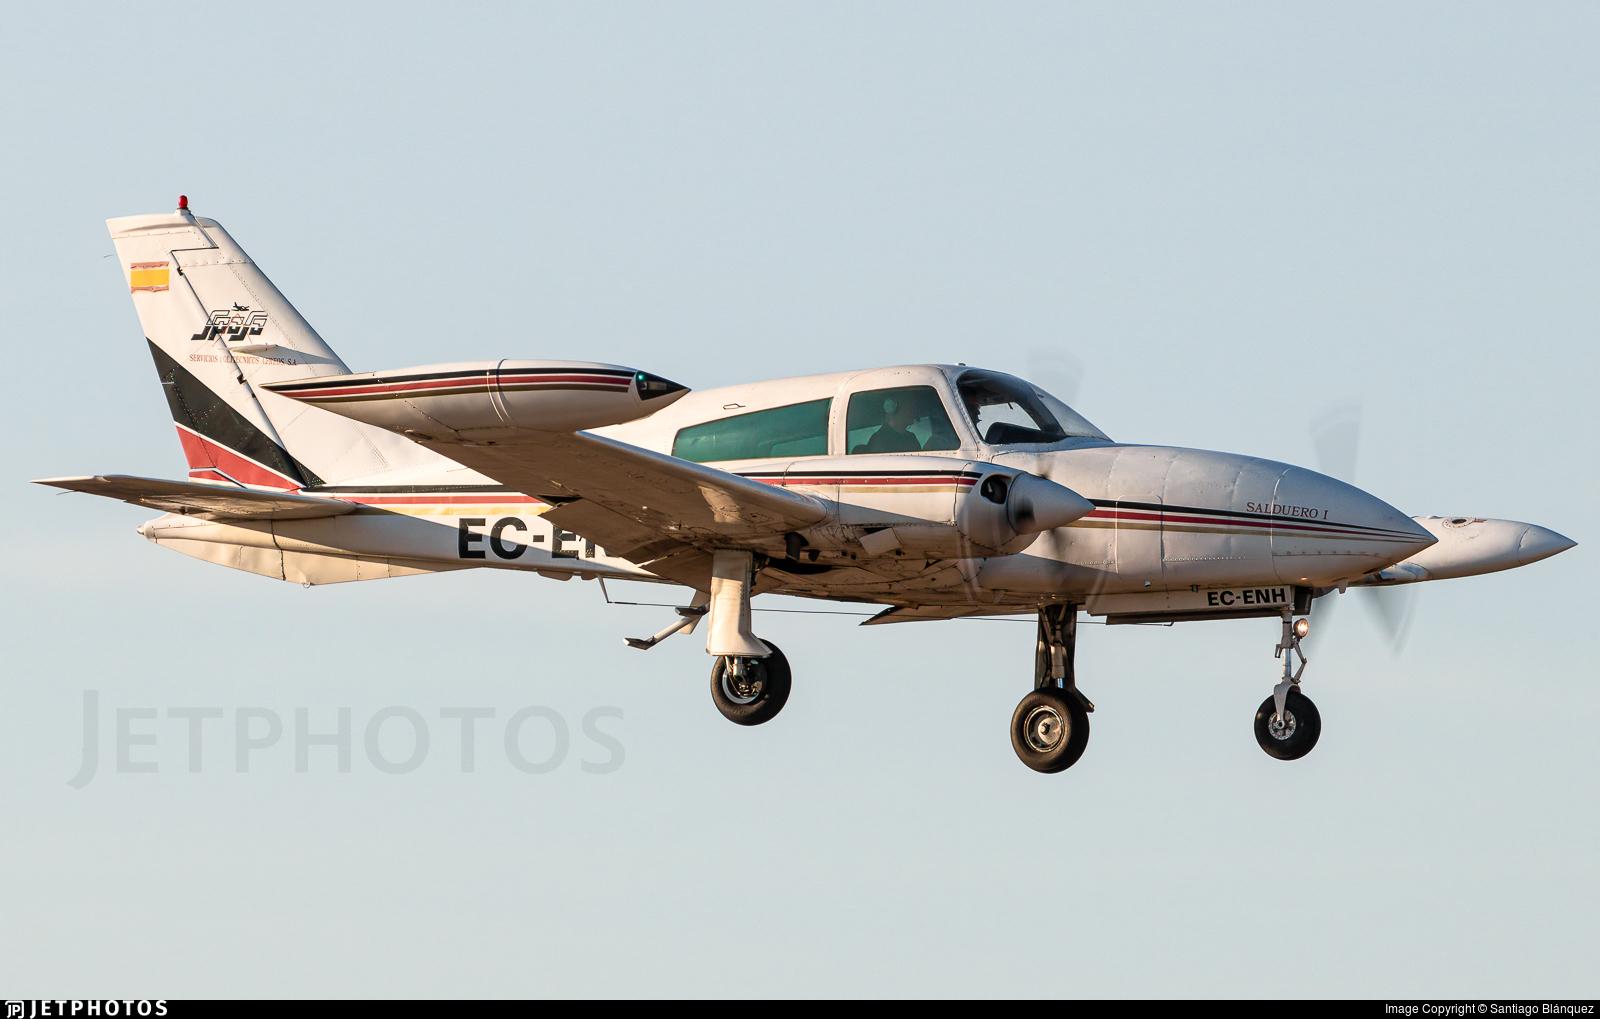 EC-ENH - Cessna T310R - Servicios Politécnicos Aéreos - SPASA